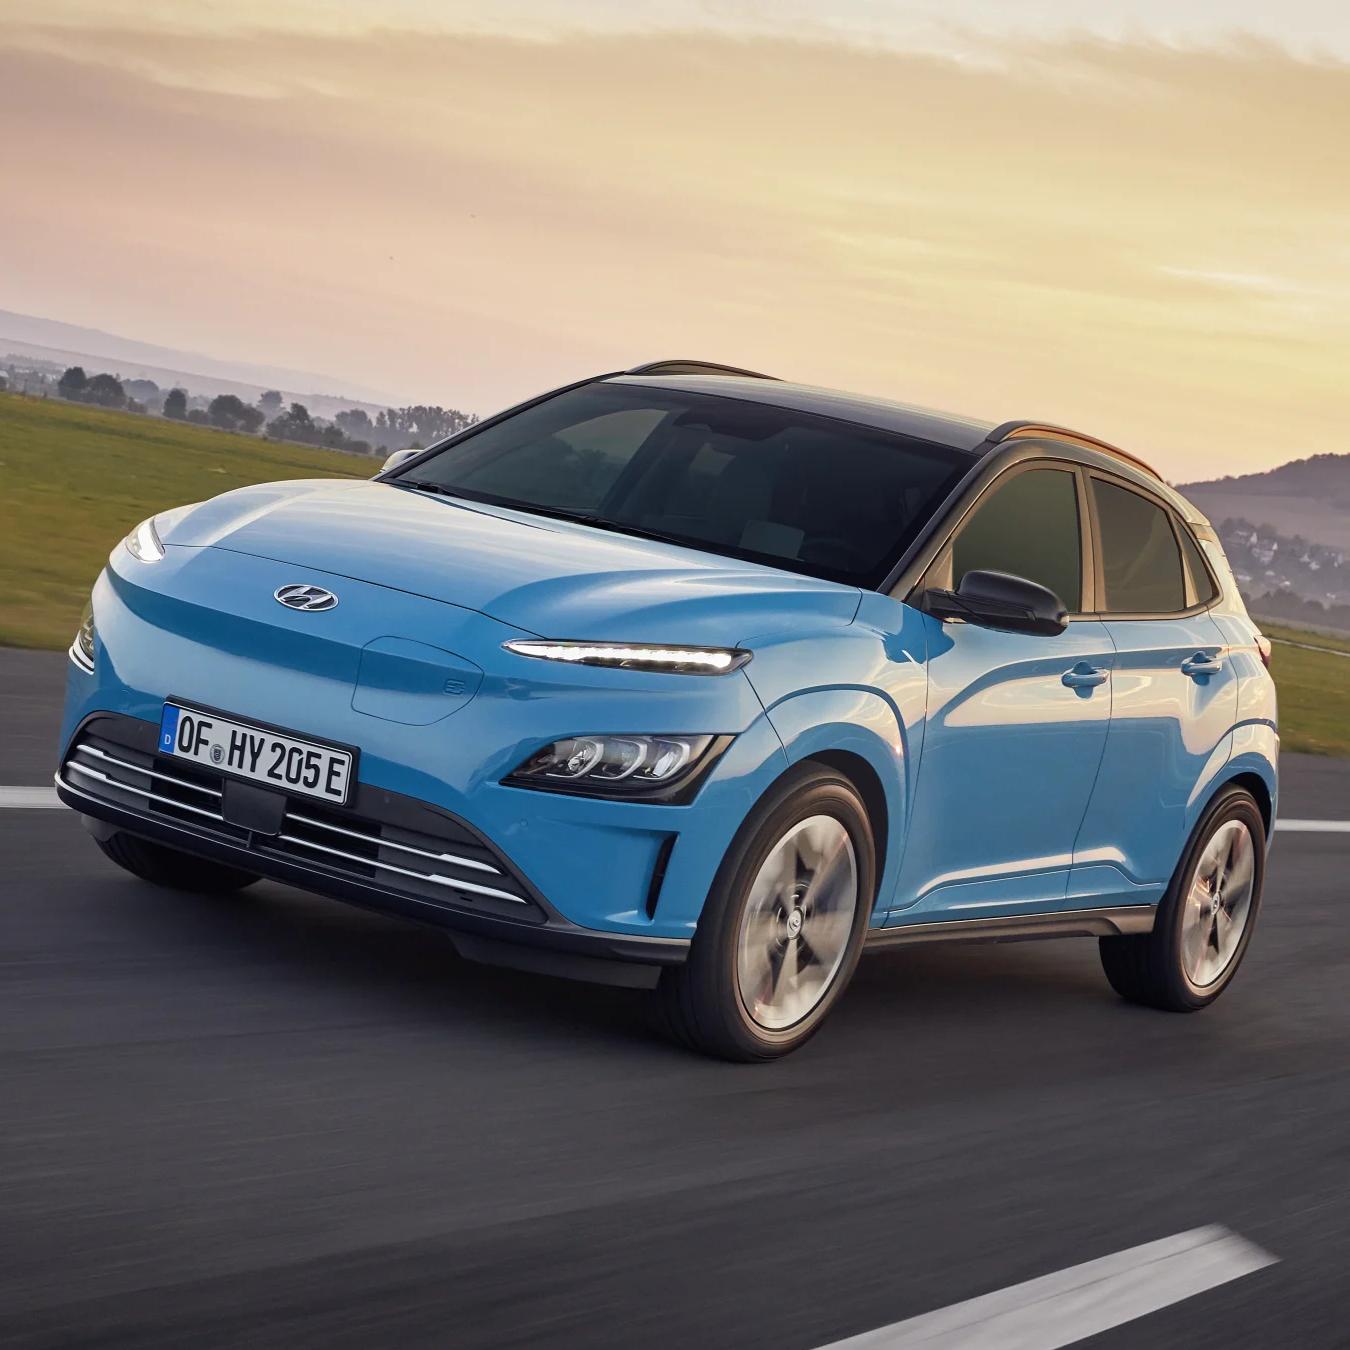 [Gewerbeleasing mit Abrufschein] Hyundai Kona Elektro (136 PS, 39,2 kWh) mtl. 11,99€ + 832€ ÜF (eff. 47€), LF 0,04, GF 0,16, 24 Monate, BAFA